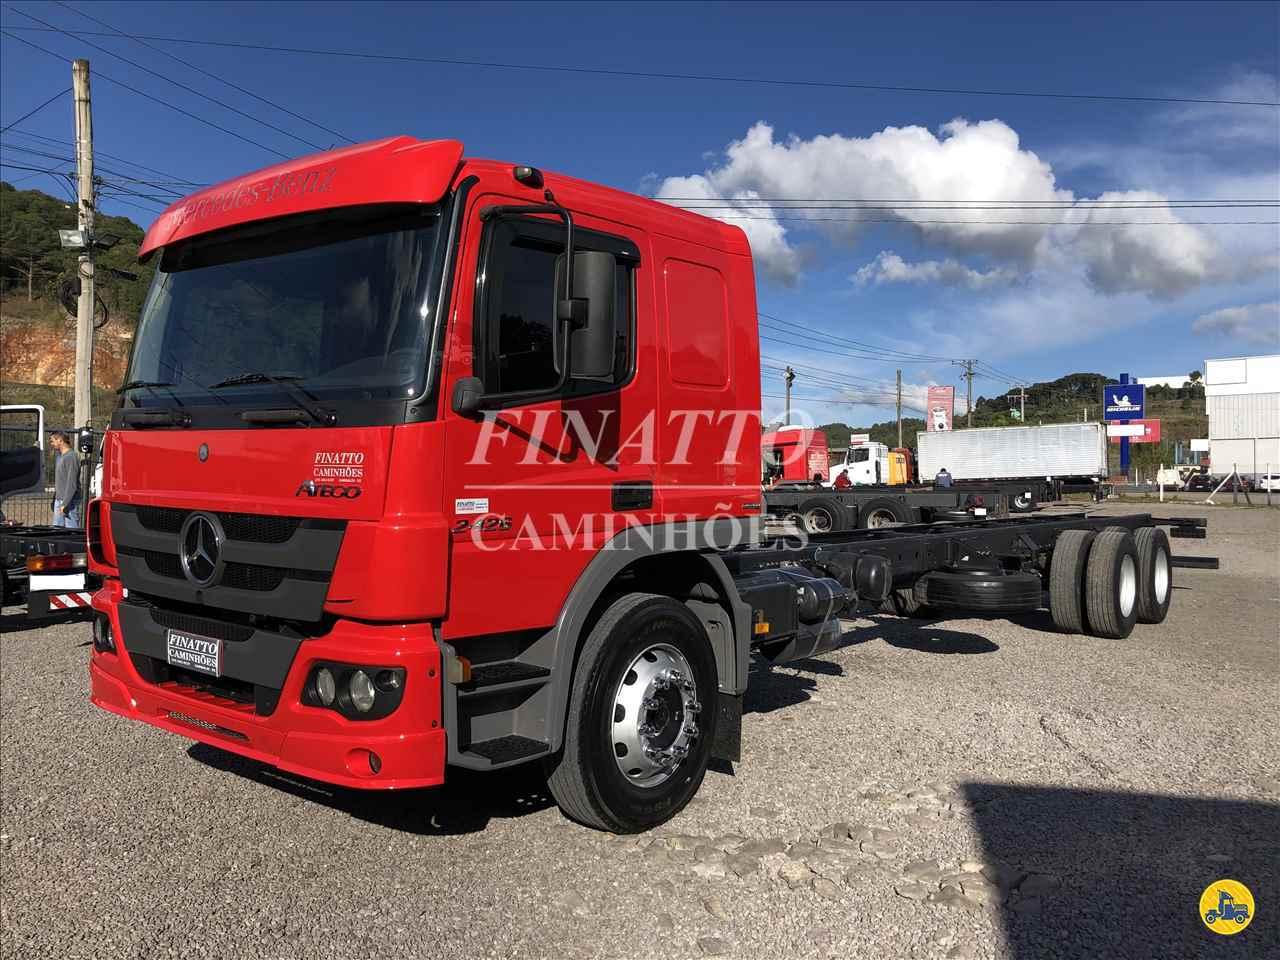 CAMINHAO MERCEDES-BENZ MB 2426 Chassis Truck 6x2 Finatto Caminhões GARIBALDI RIO GRANDE DO SUL RS